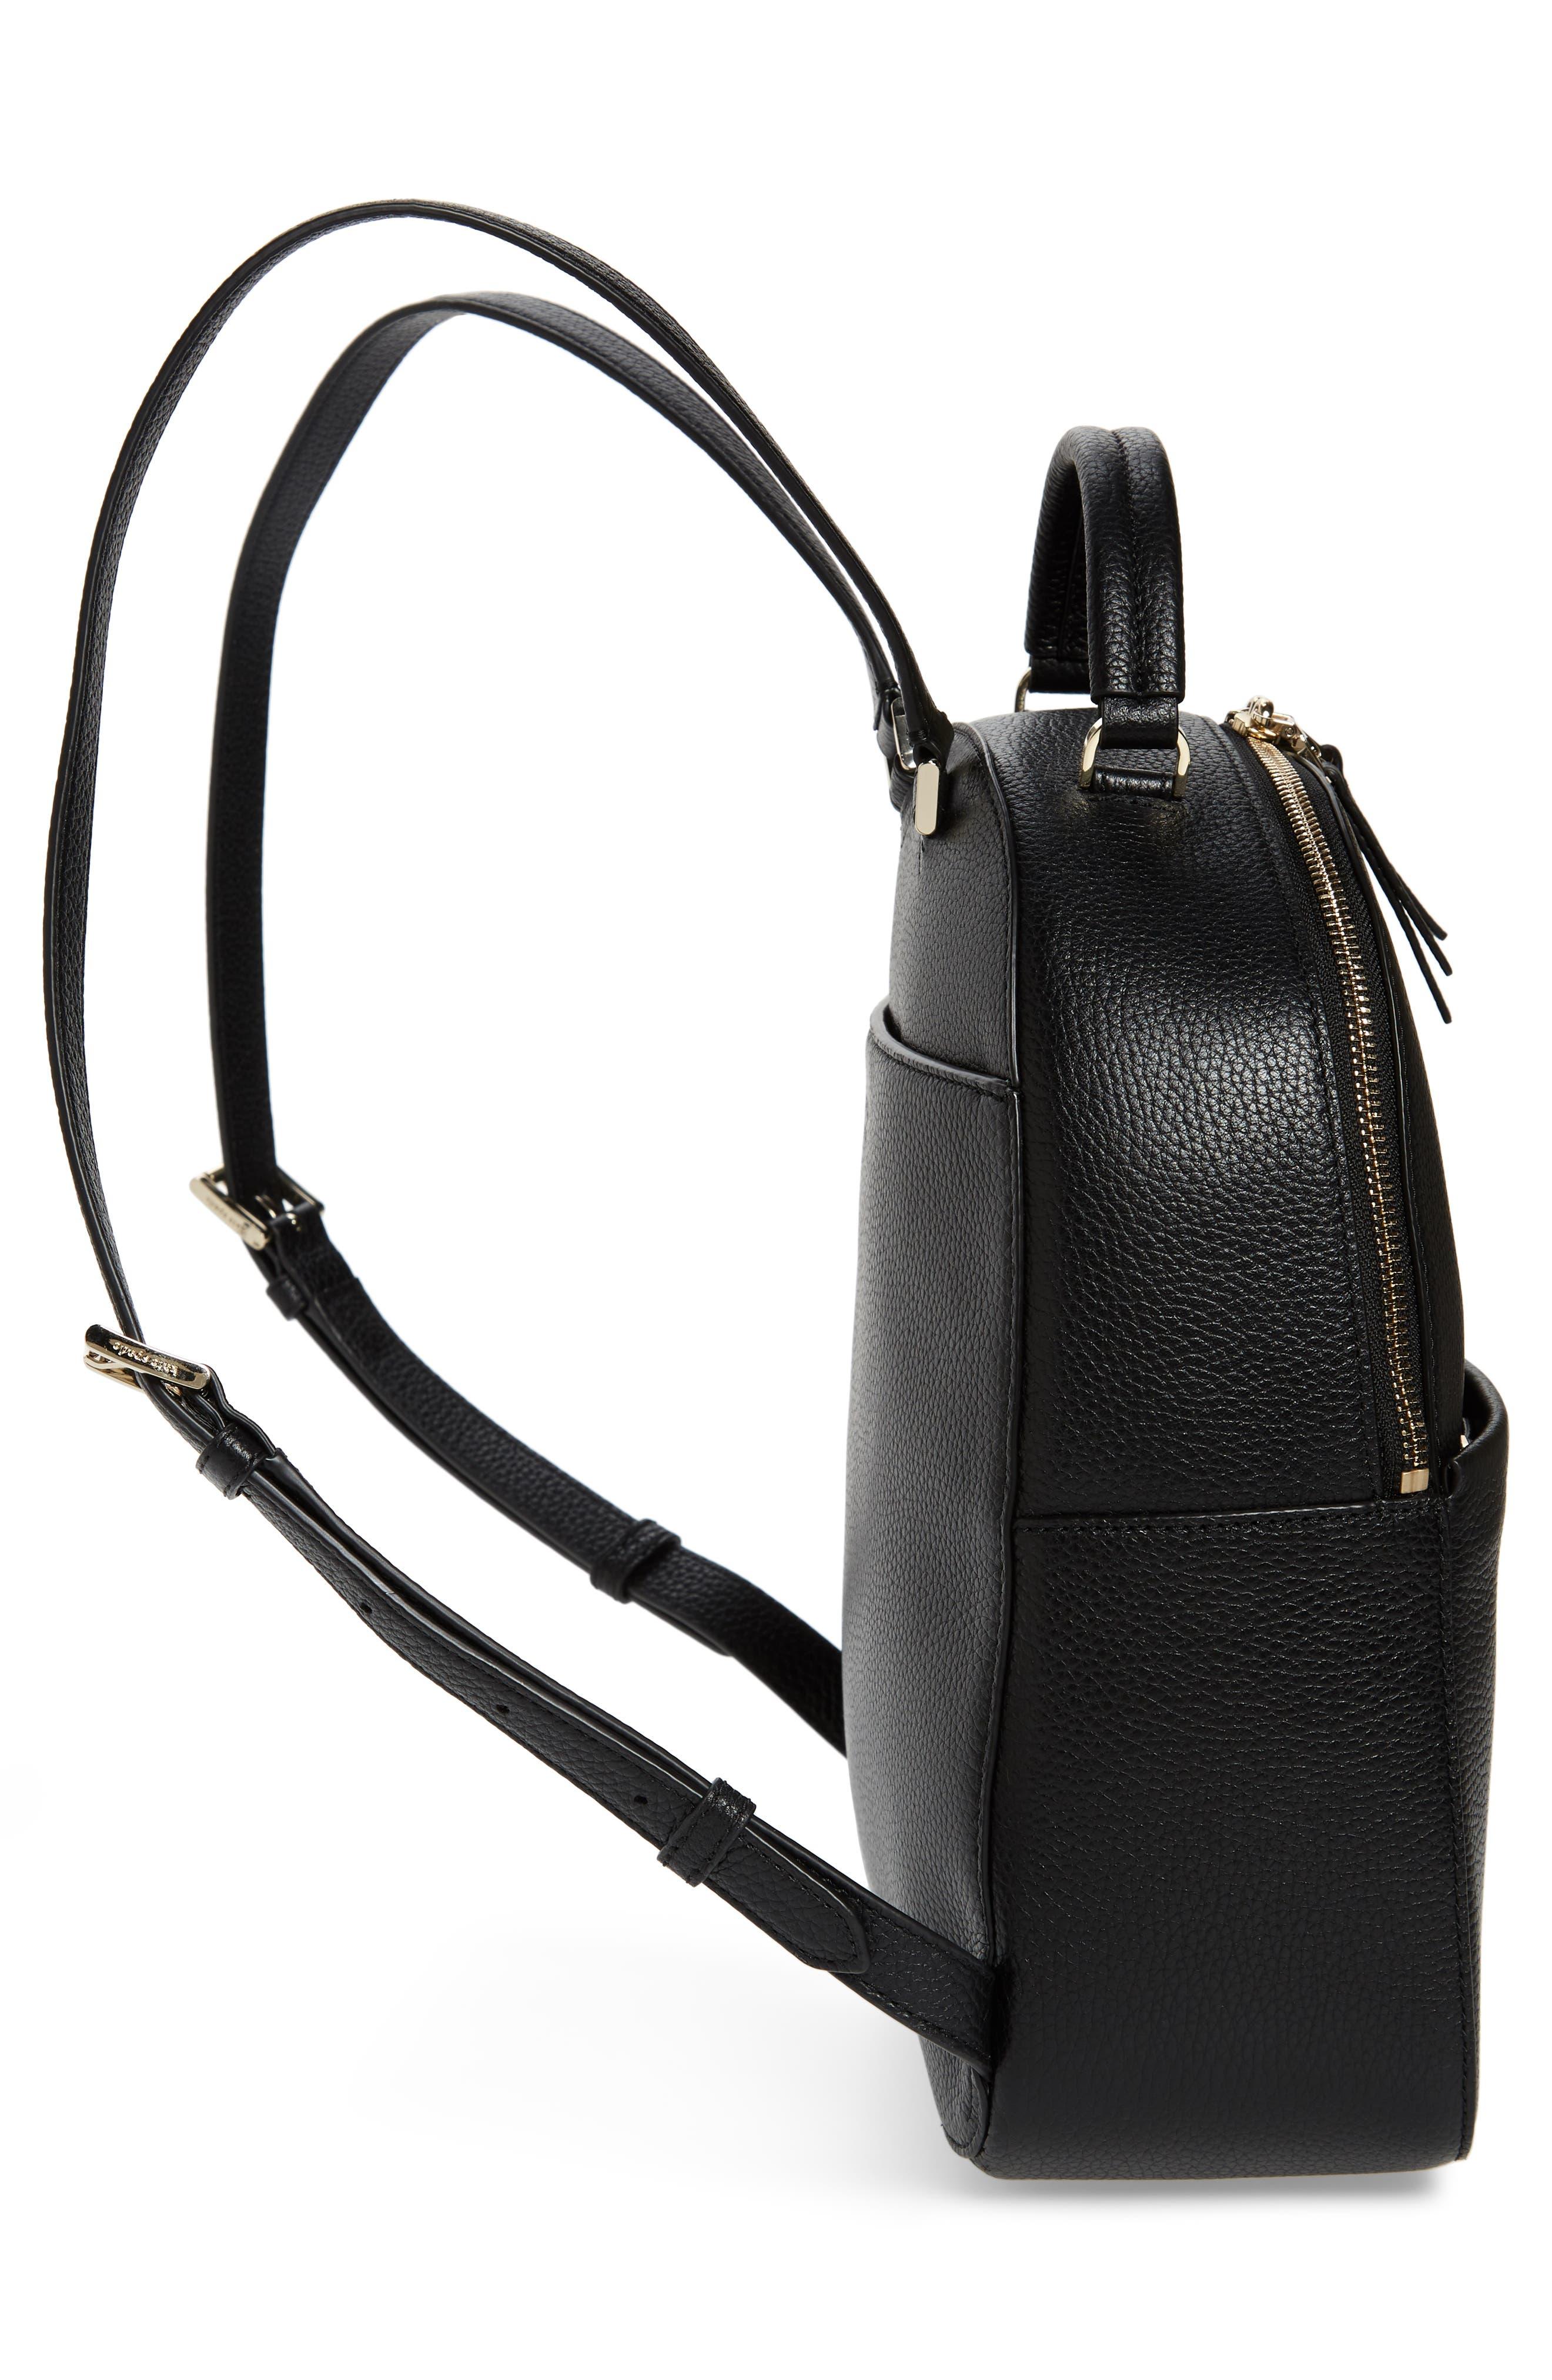 KATE SPADE NEW YORK, medium polly leather backpack, Alternate thumbnail 5, color, BLACK